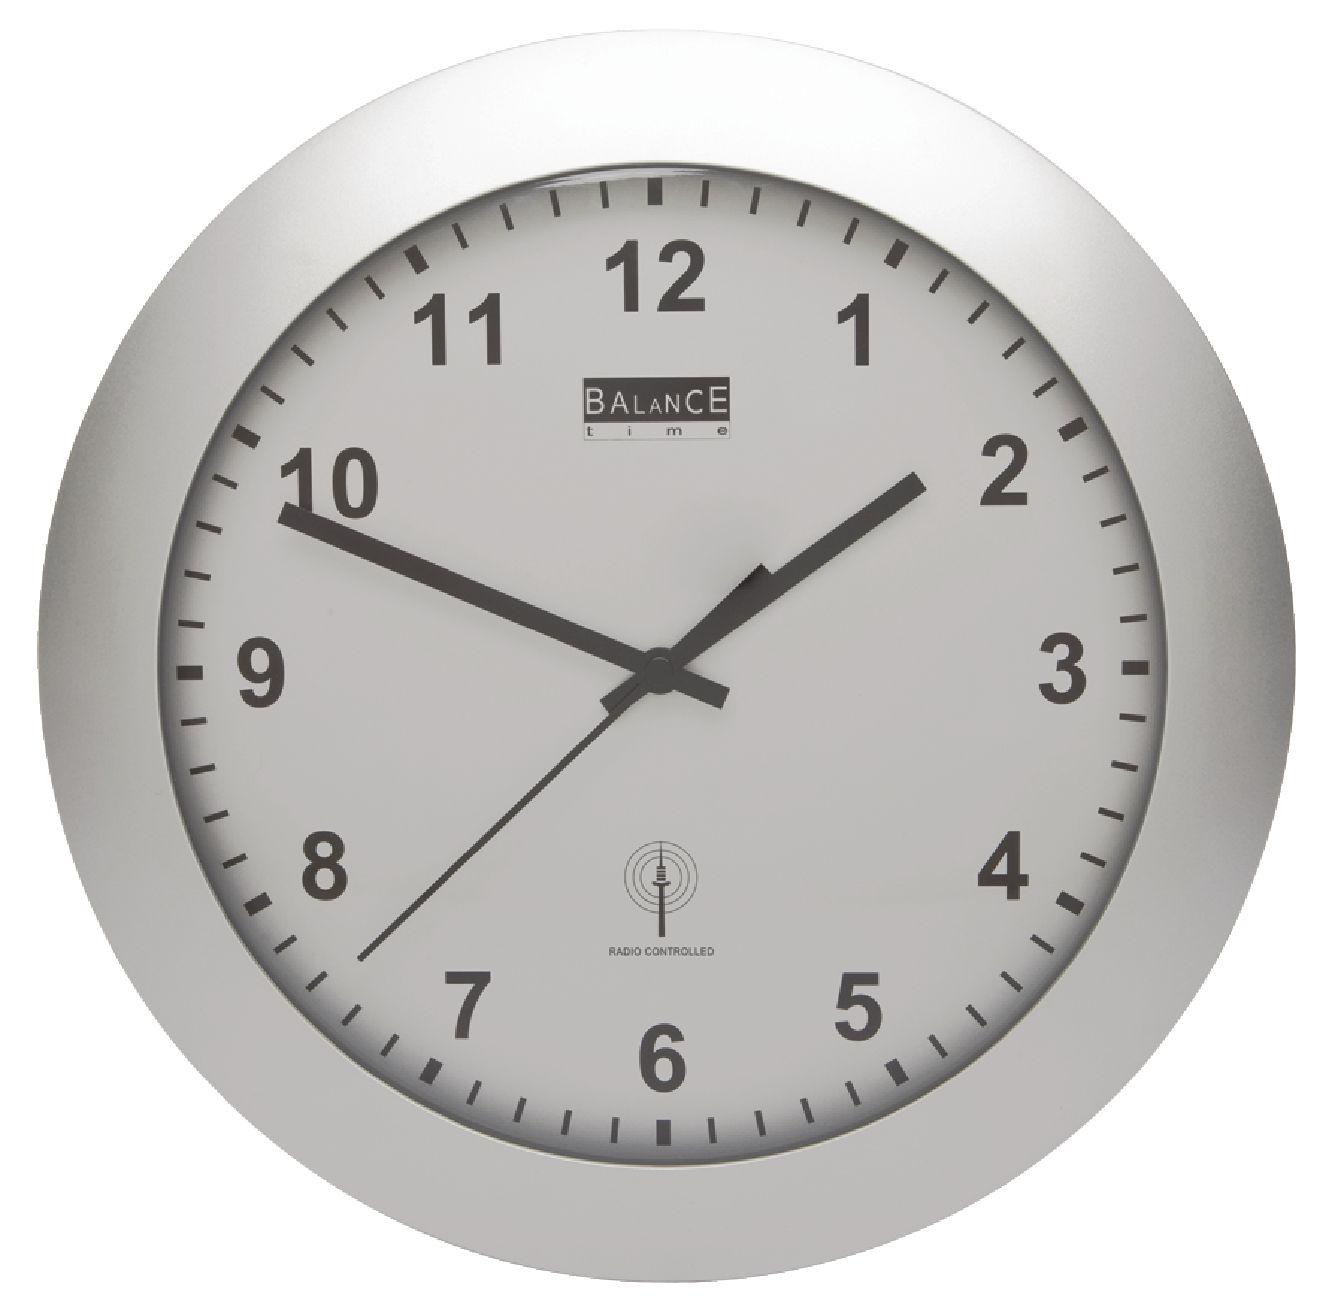 He Clock 88 Balance Radio Controlled Wall Clock 30 Cm